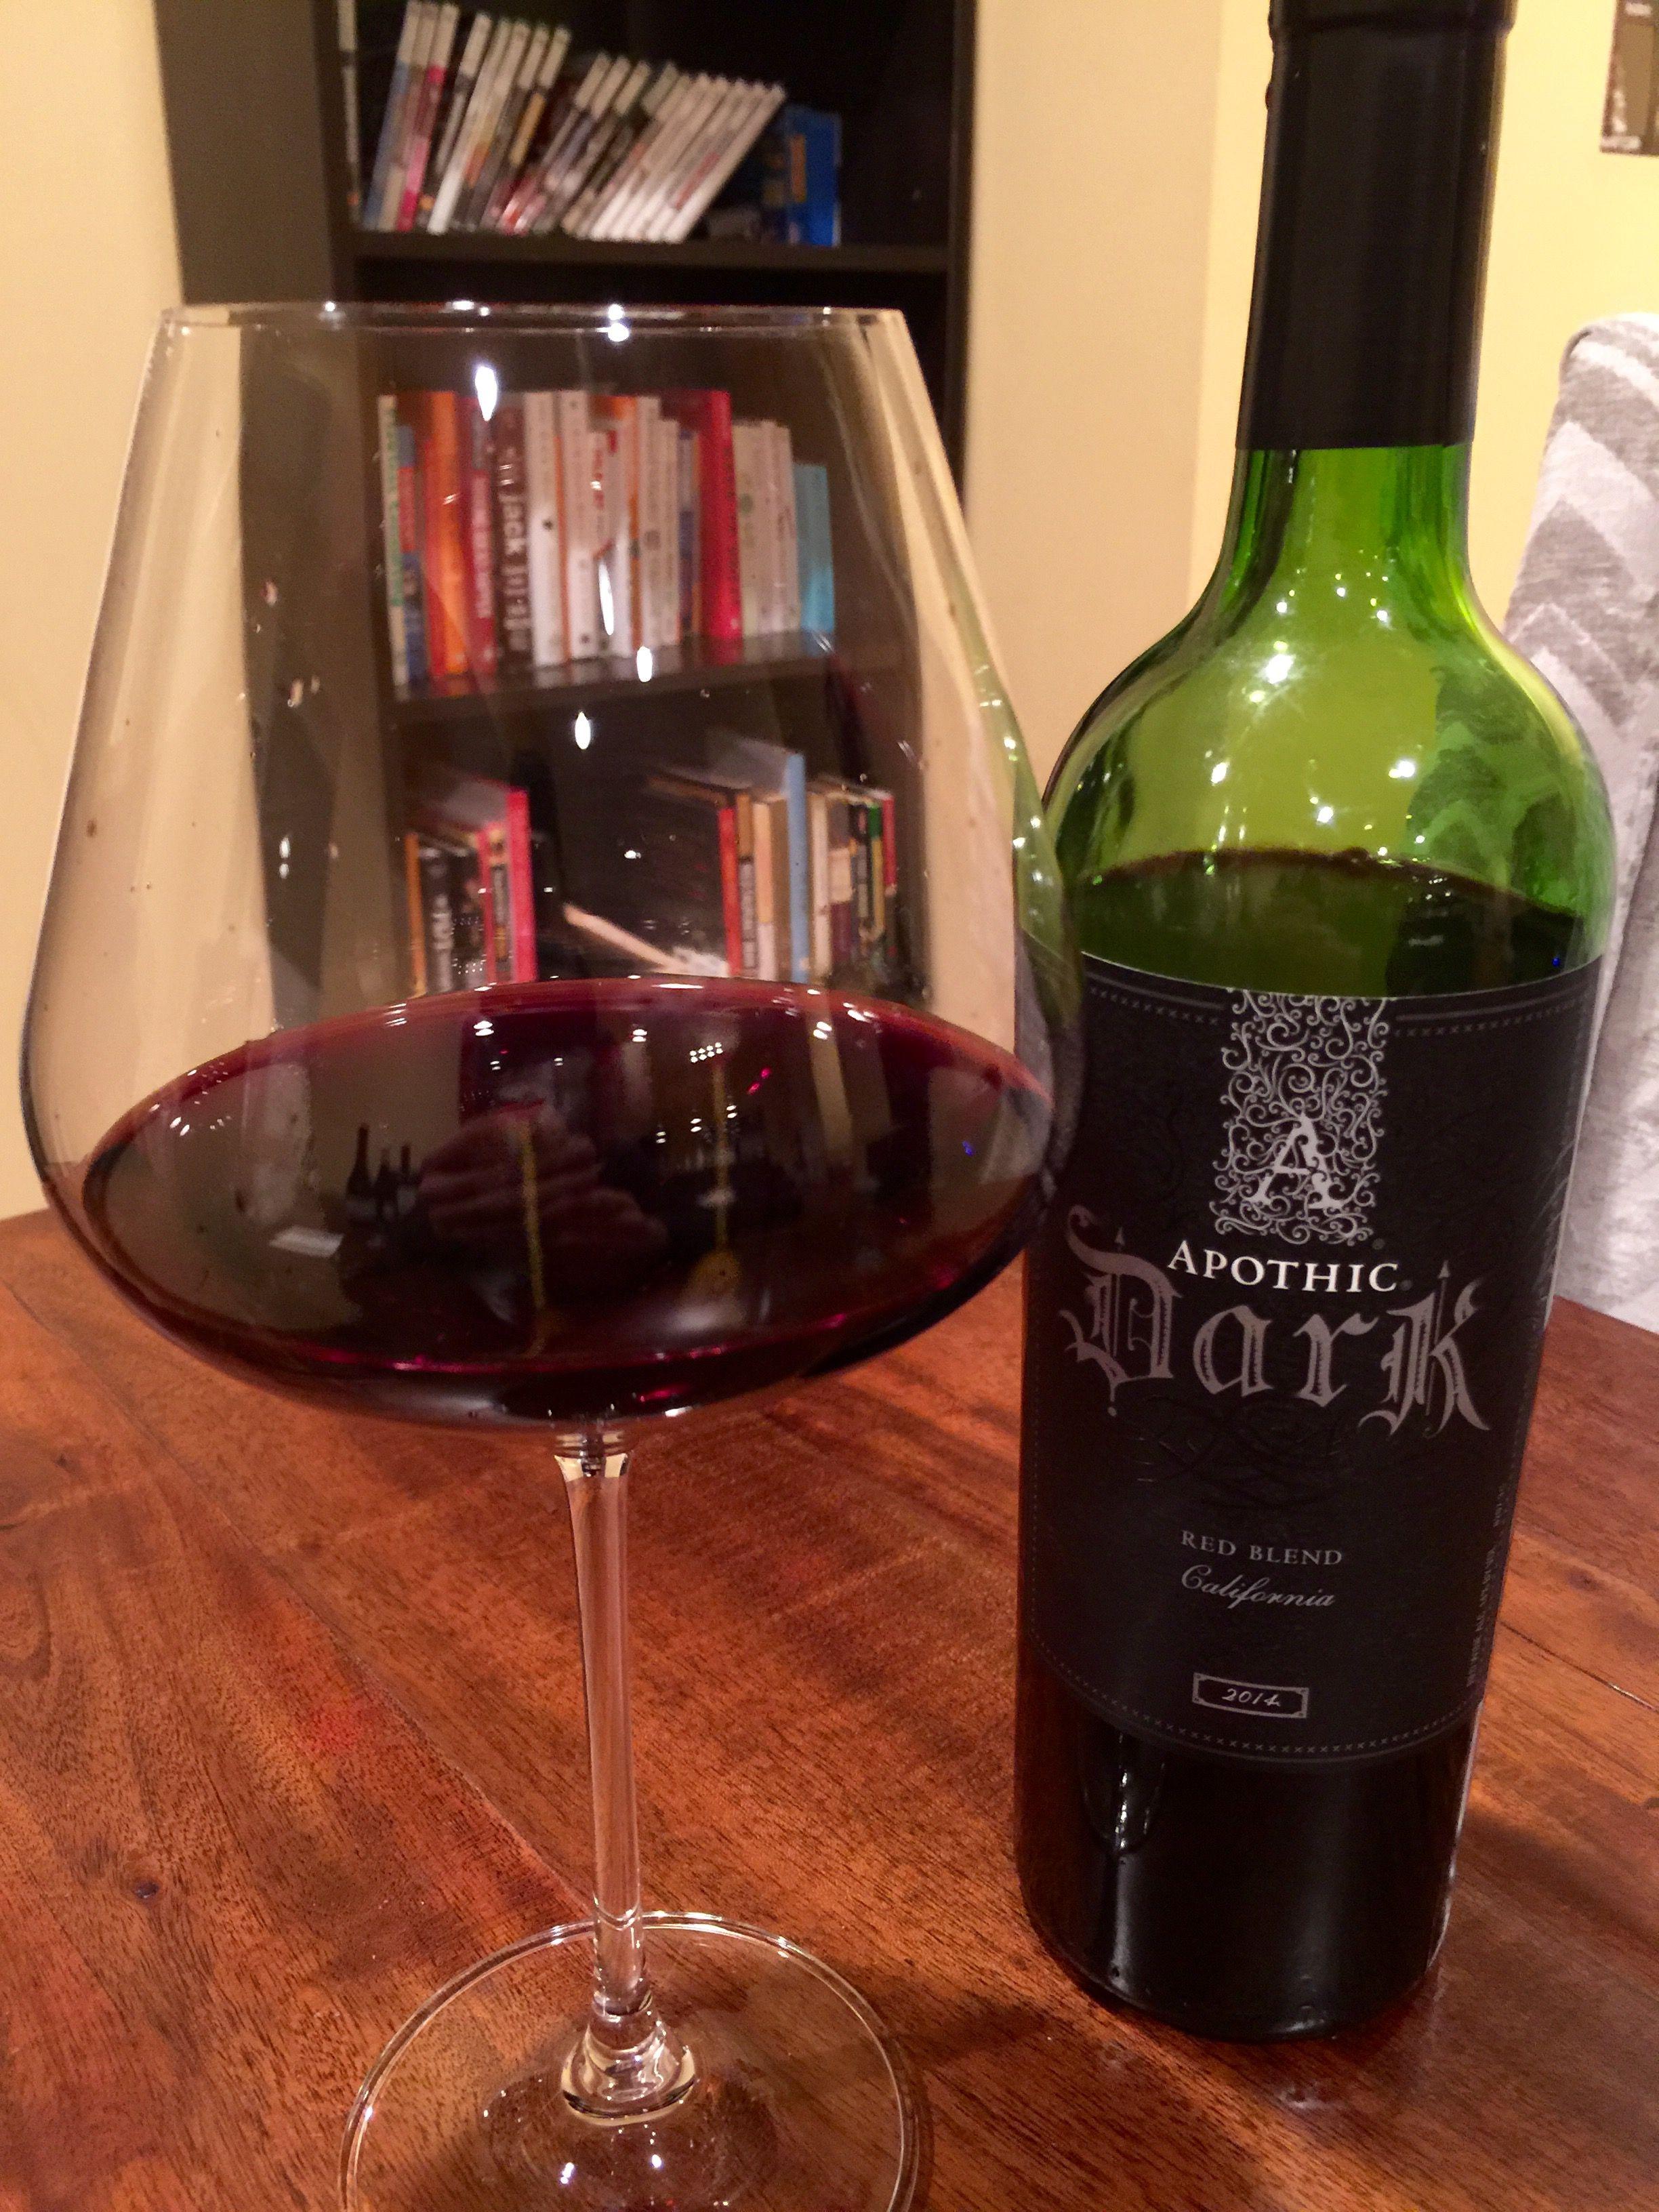 Apothic Dark 2014 Red Wine Alcoholic Drinks Dark